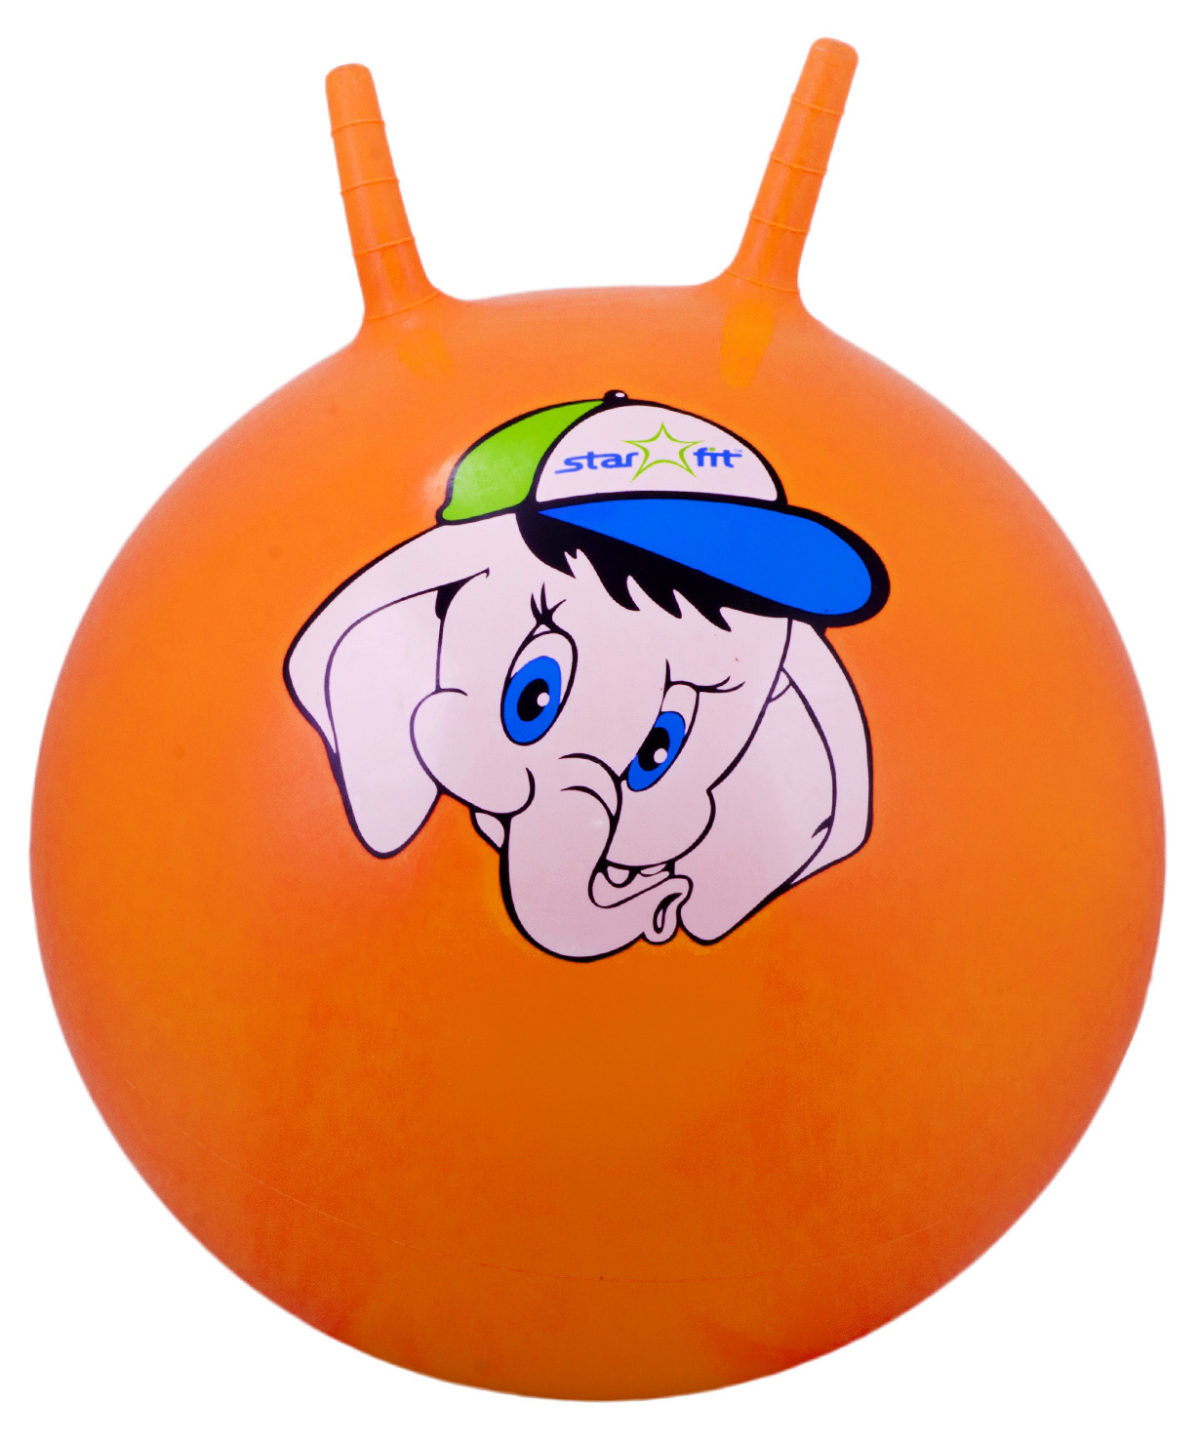 "STARFIT Мяч попрыгун ""Слоненок"",45см GB-401 слоненок: оранжевый - 1"